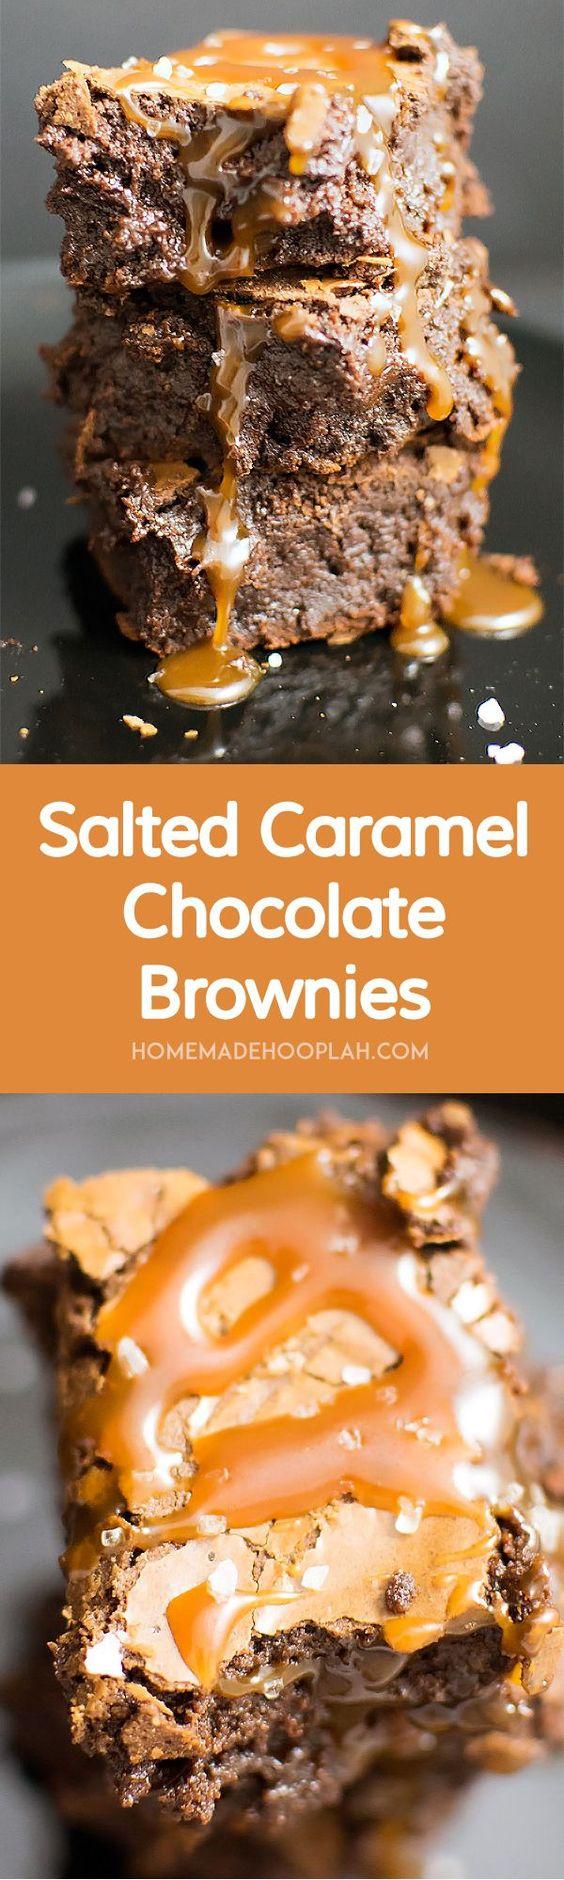 Salted Caramel Chocolate Brownies | Recipe | Salted Caramel Chocolate ...